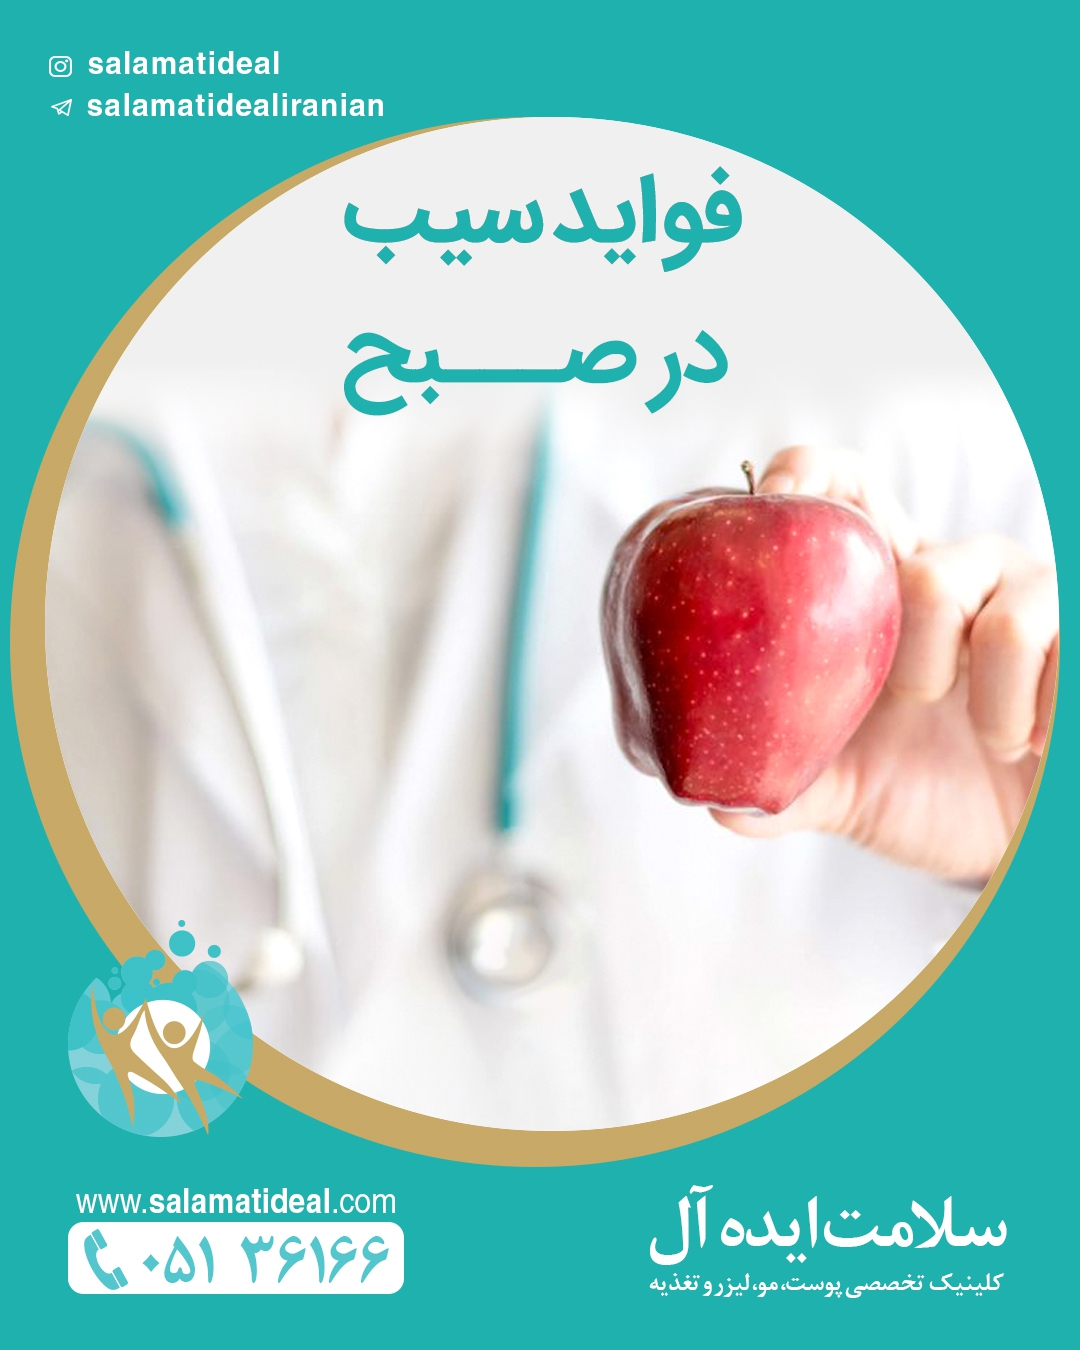 Telegram template1 1500x2000 - سلامت ایده آل